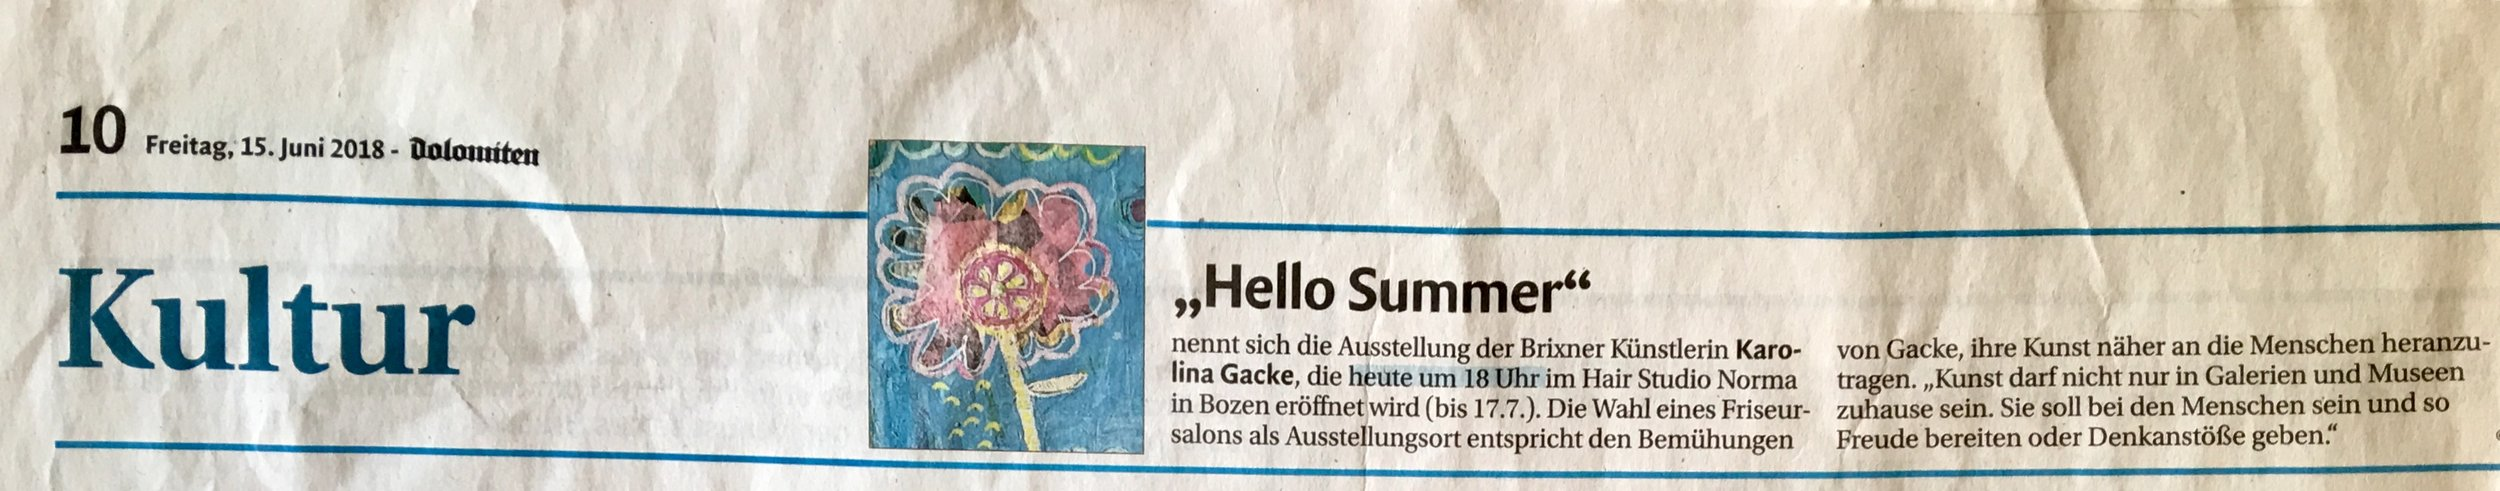 Ankündigung Dolomiten Hello Summer 062018.jpg